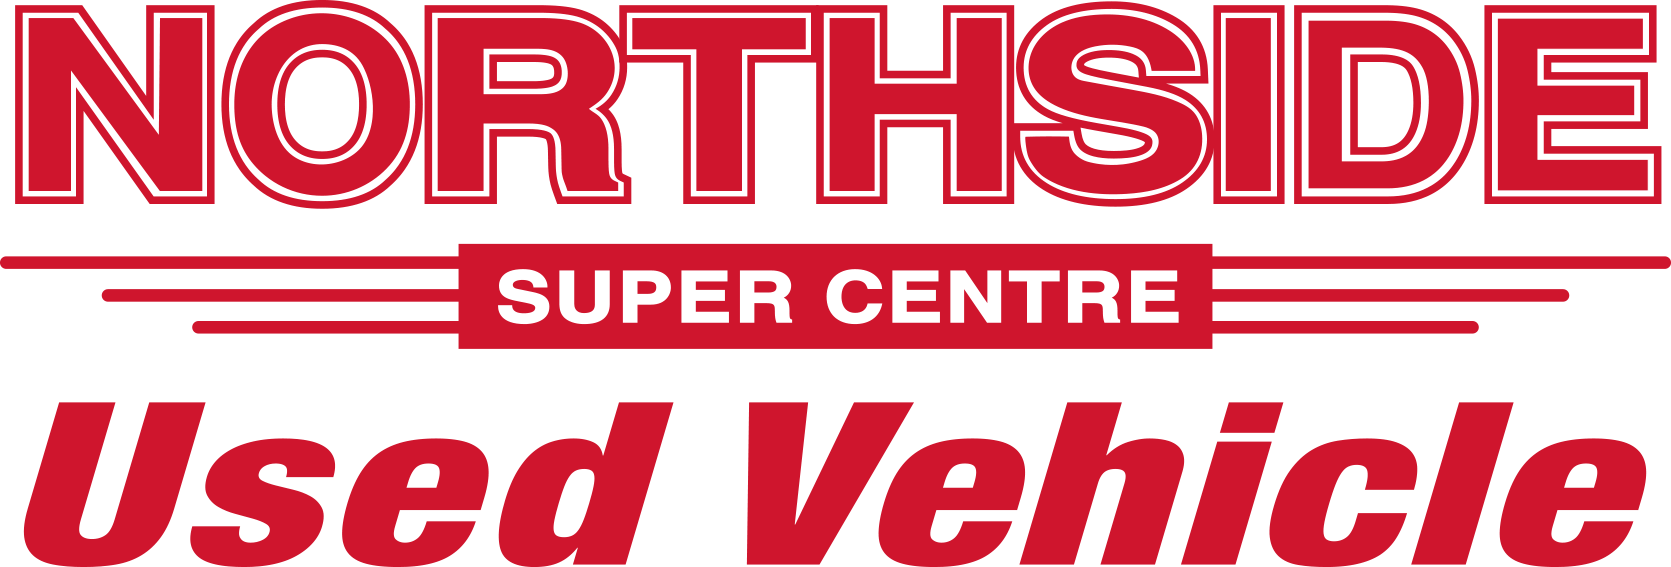 Northside Used Vehicle Super Centre